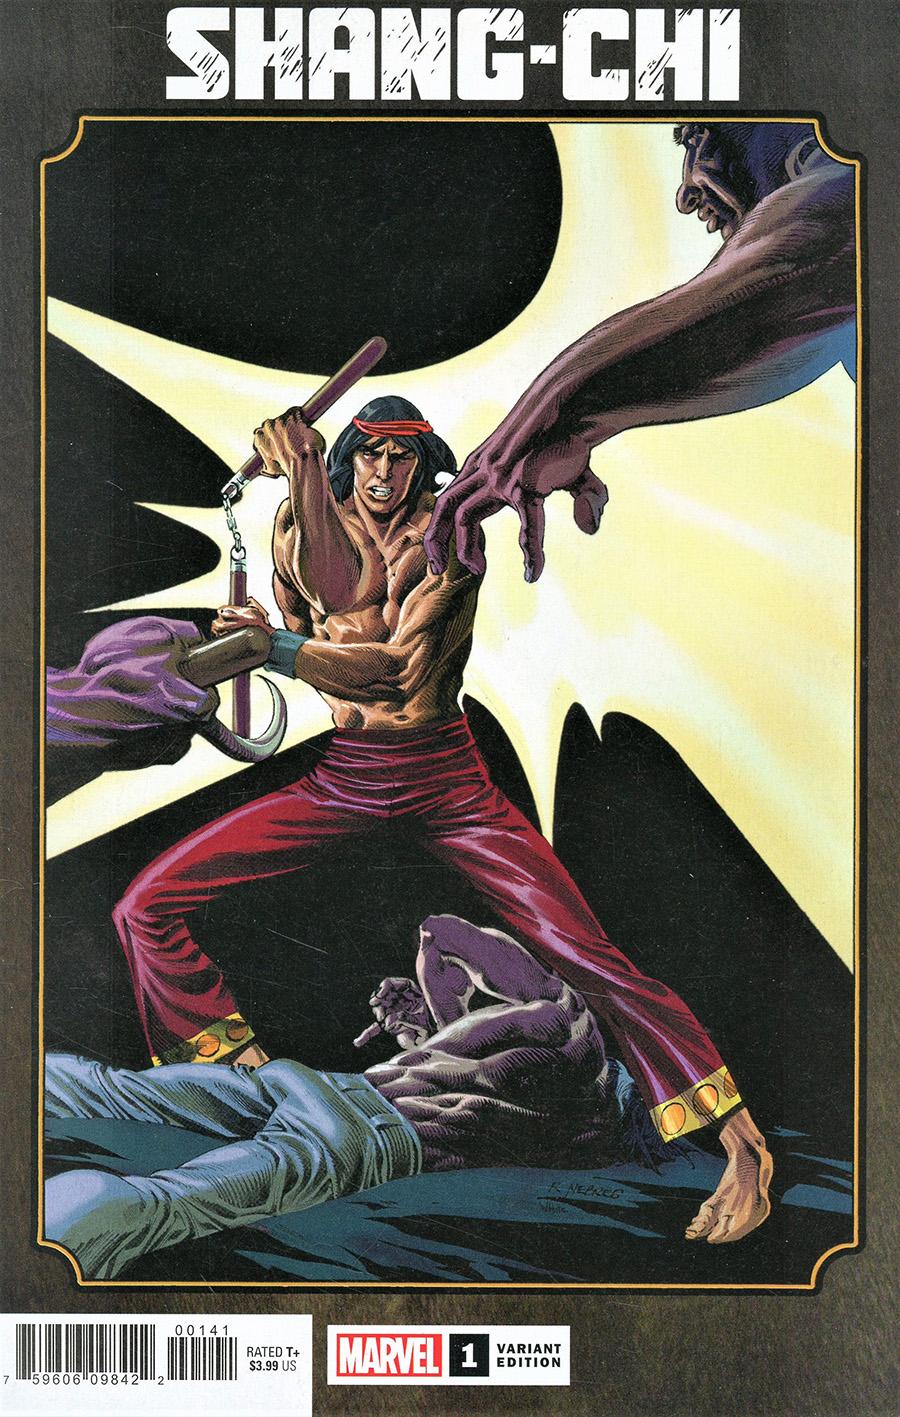 Shang-Chi #1 Cover C Variant Rudy Nebres Hidden Gem Cover